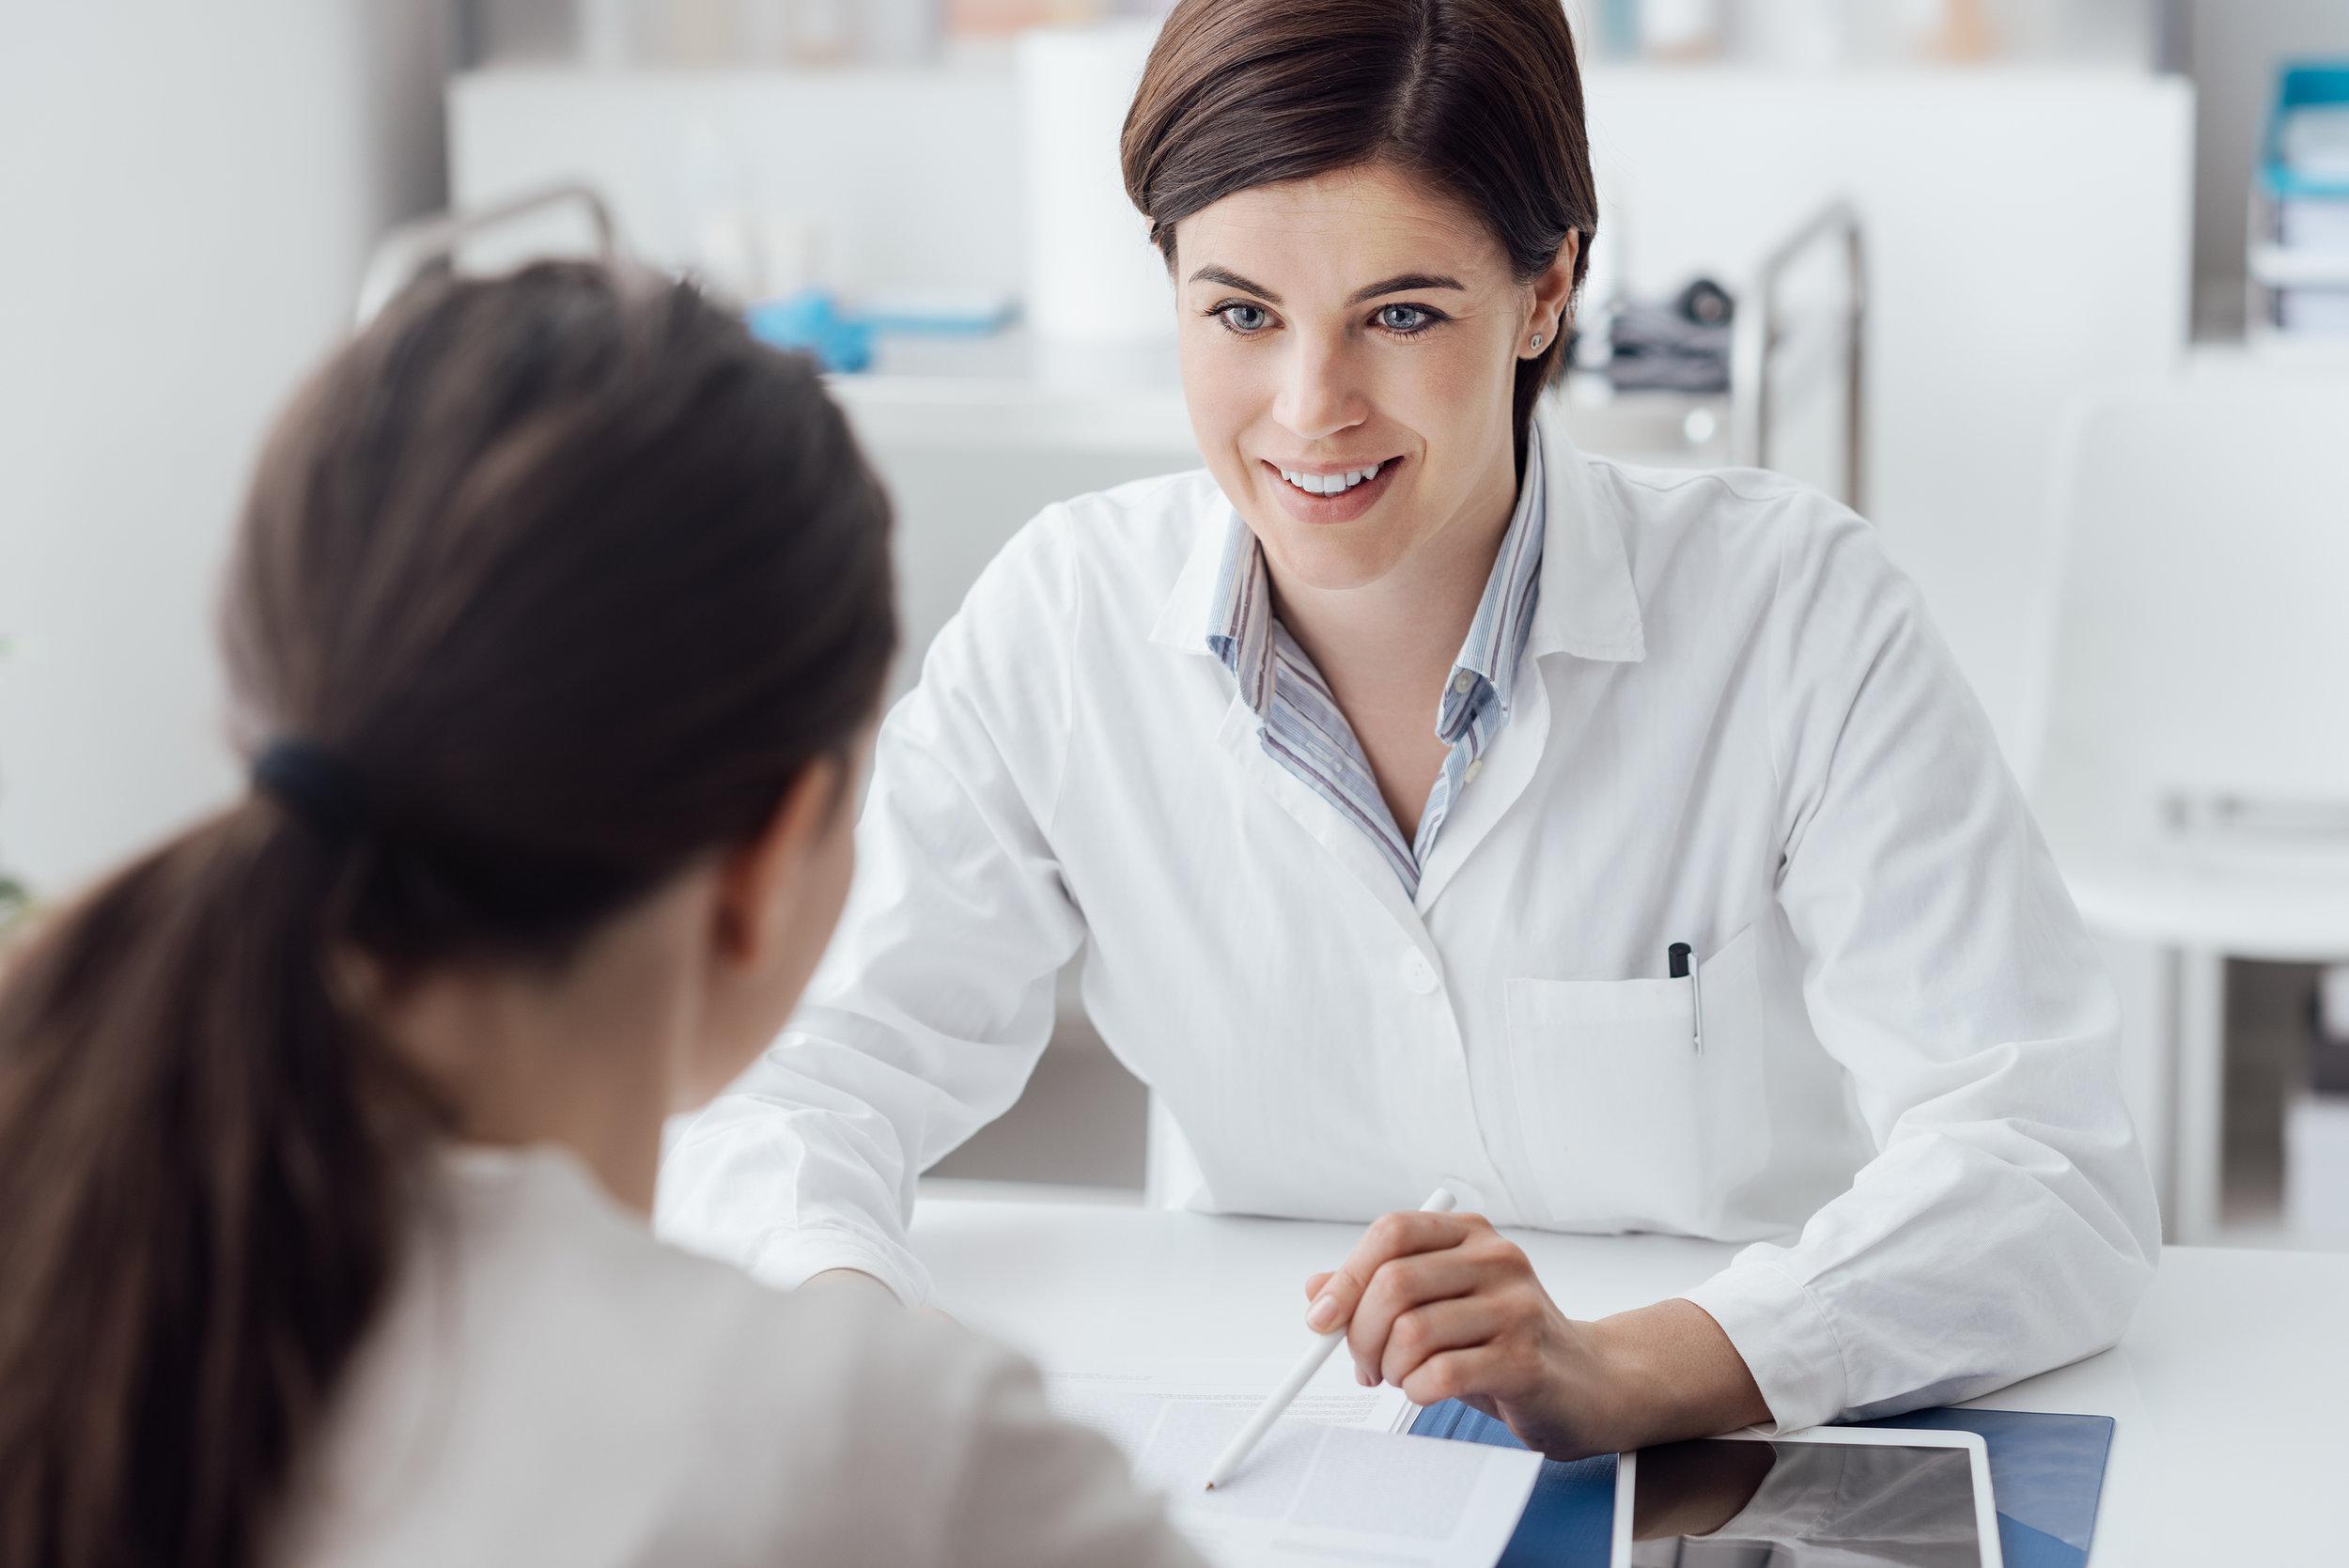 bigstock-Doctor-Explaining-Diagnosis-To-173662004.jpg